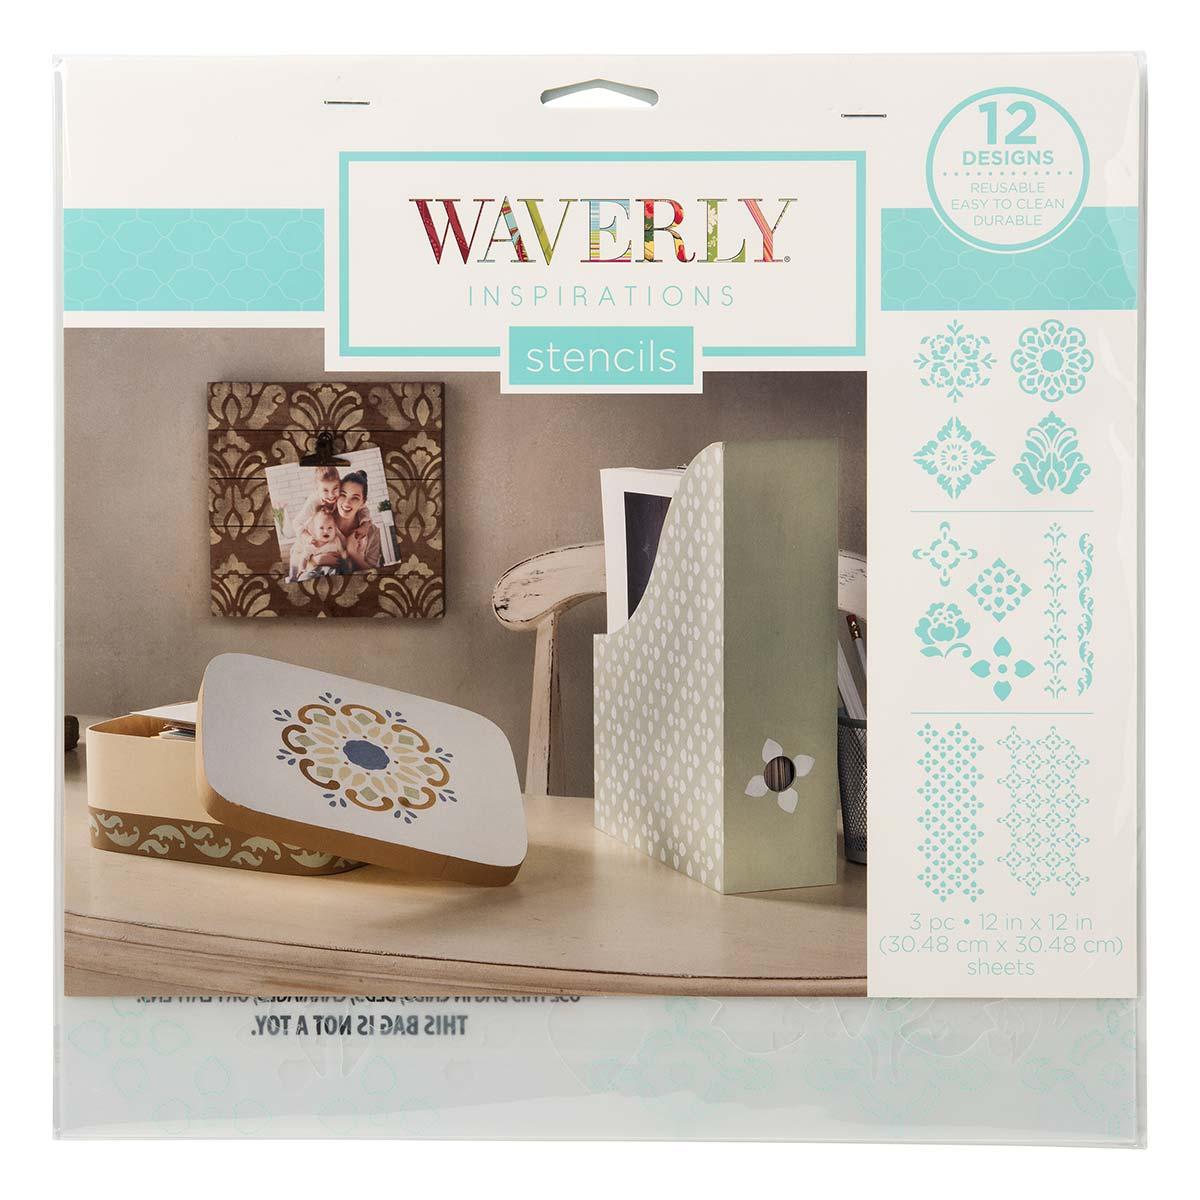 Waverly ® Inspirations Laser Stencils - Décor - Medallions, 12